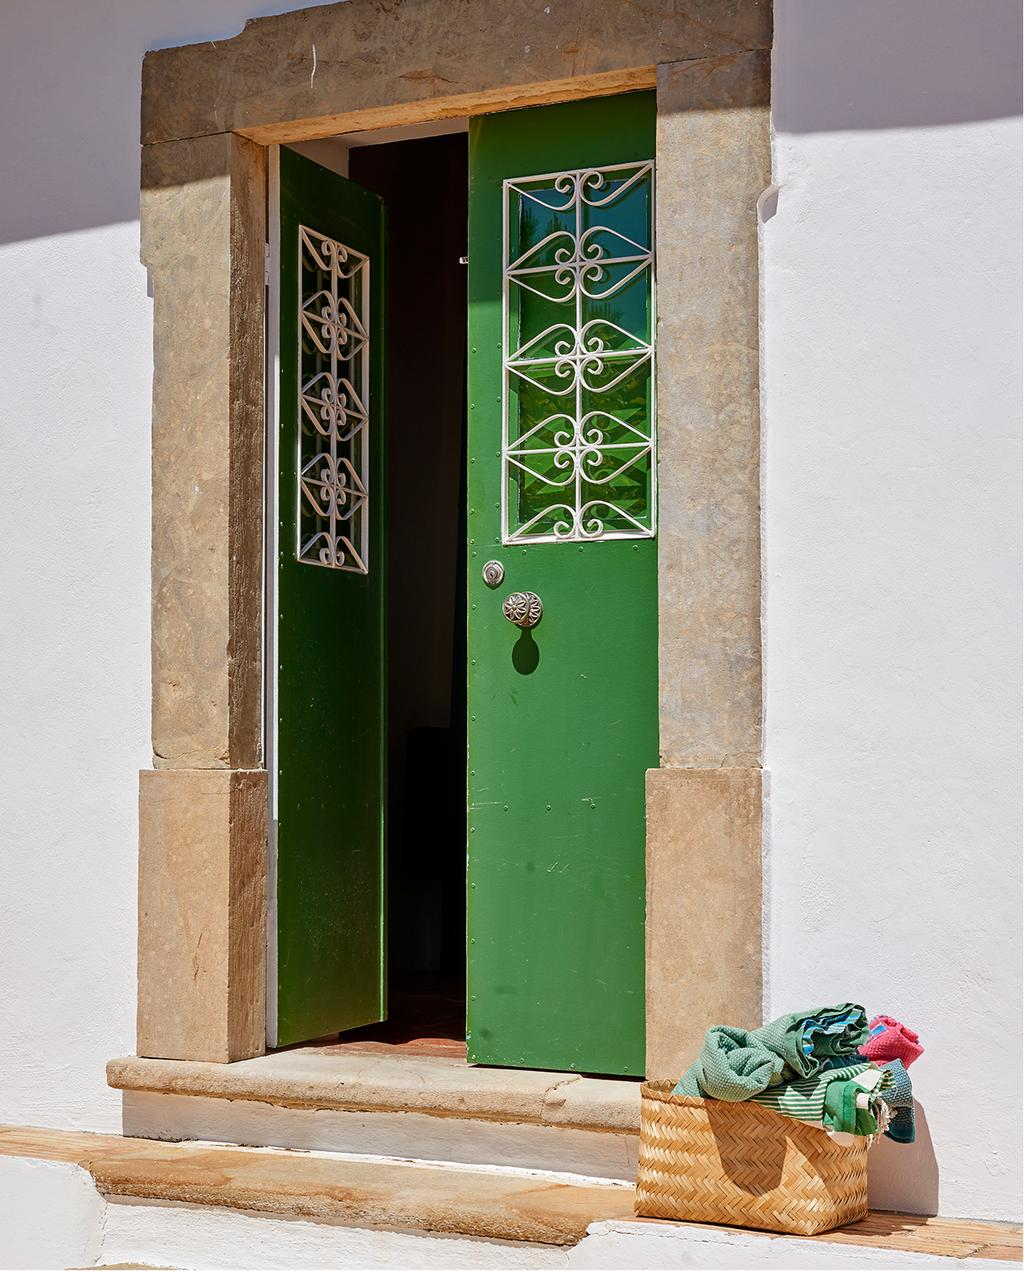 vtwonen tuin special 2 2020 | groene voordeur en betegelde trappen